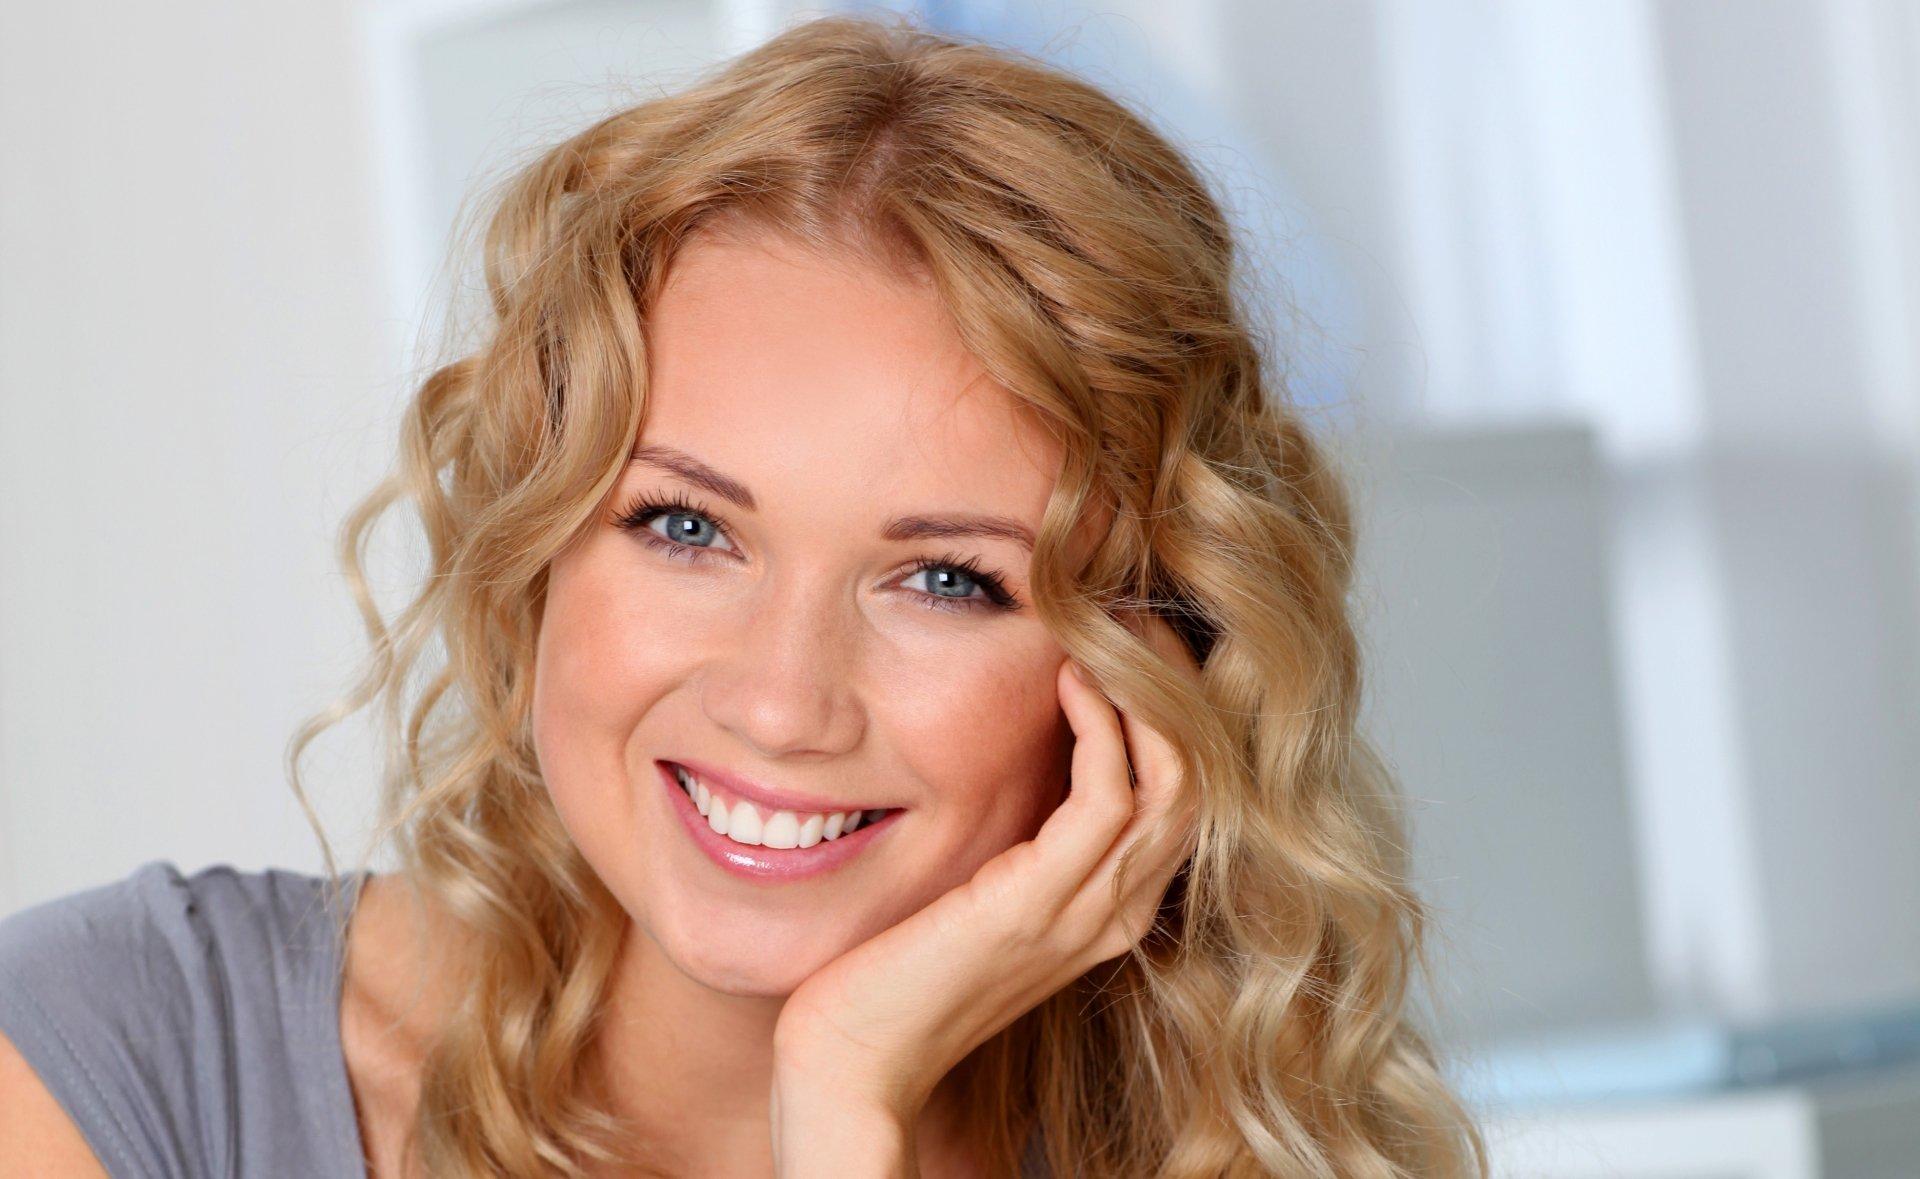 Women - Face  Woman Model Girl Blonde Blue Eyes Smile Wallpaper